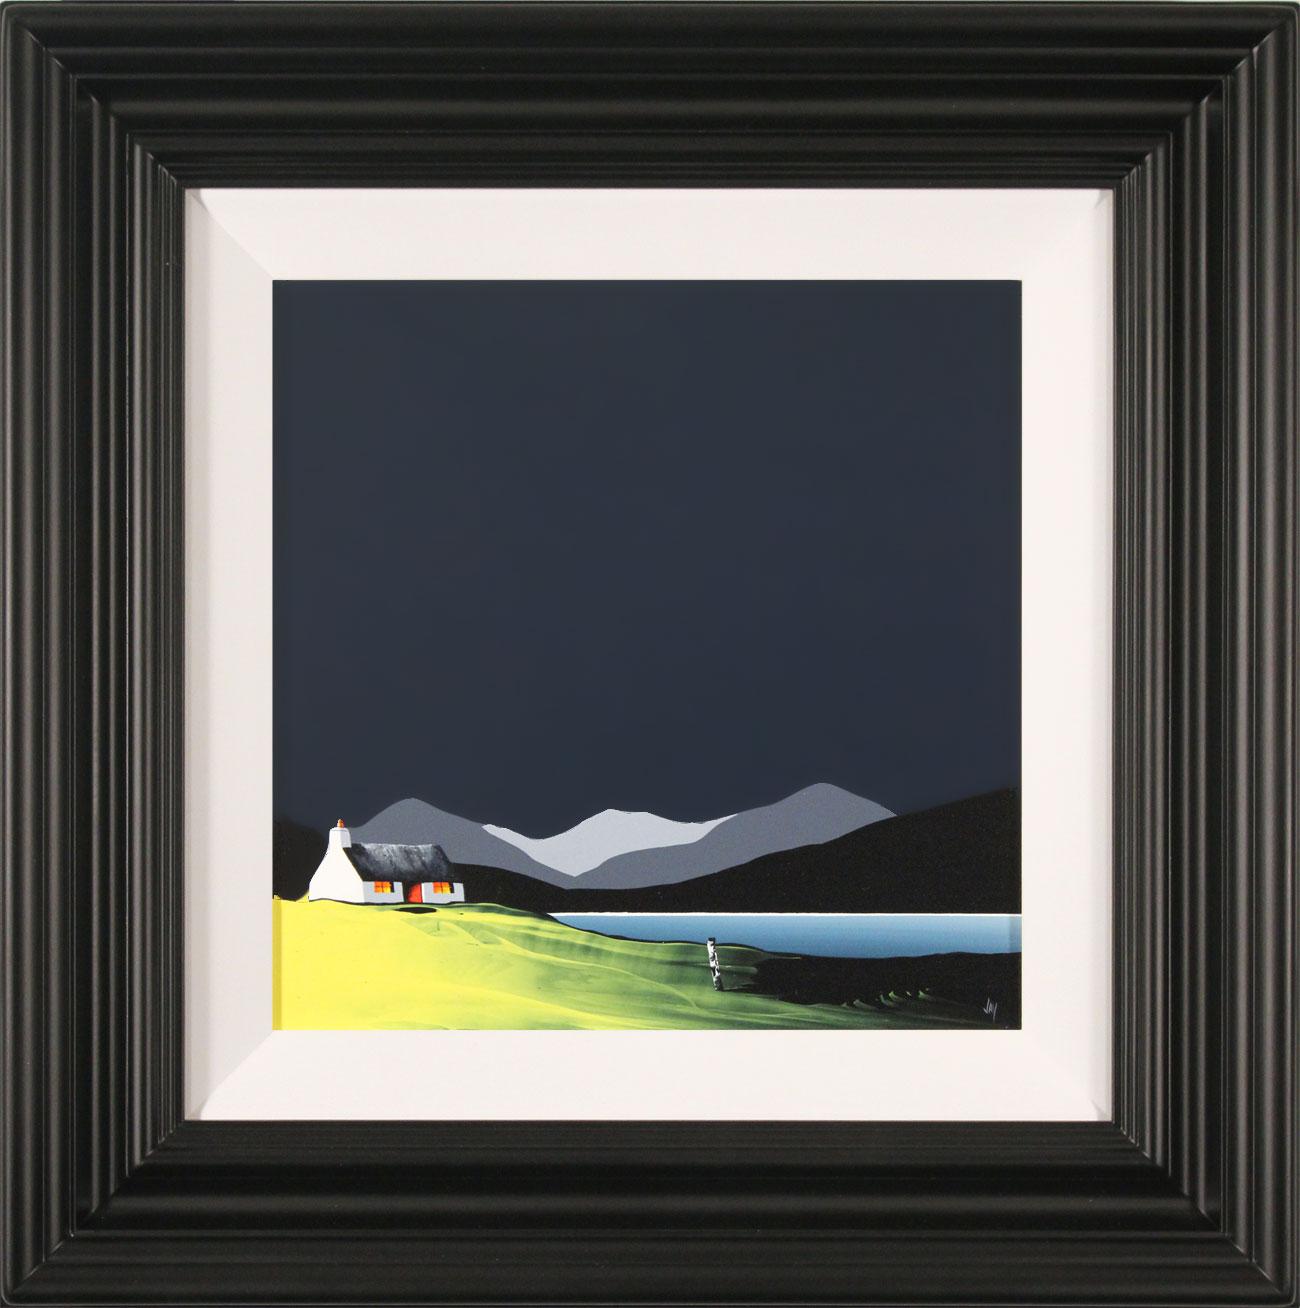 Jay Nottingham, Original oil painting on panel, Slate Cottage, click to enlarge